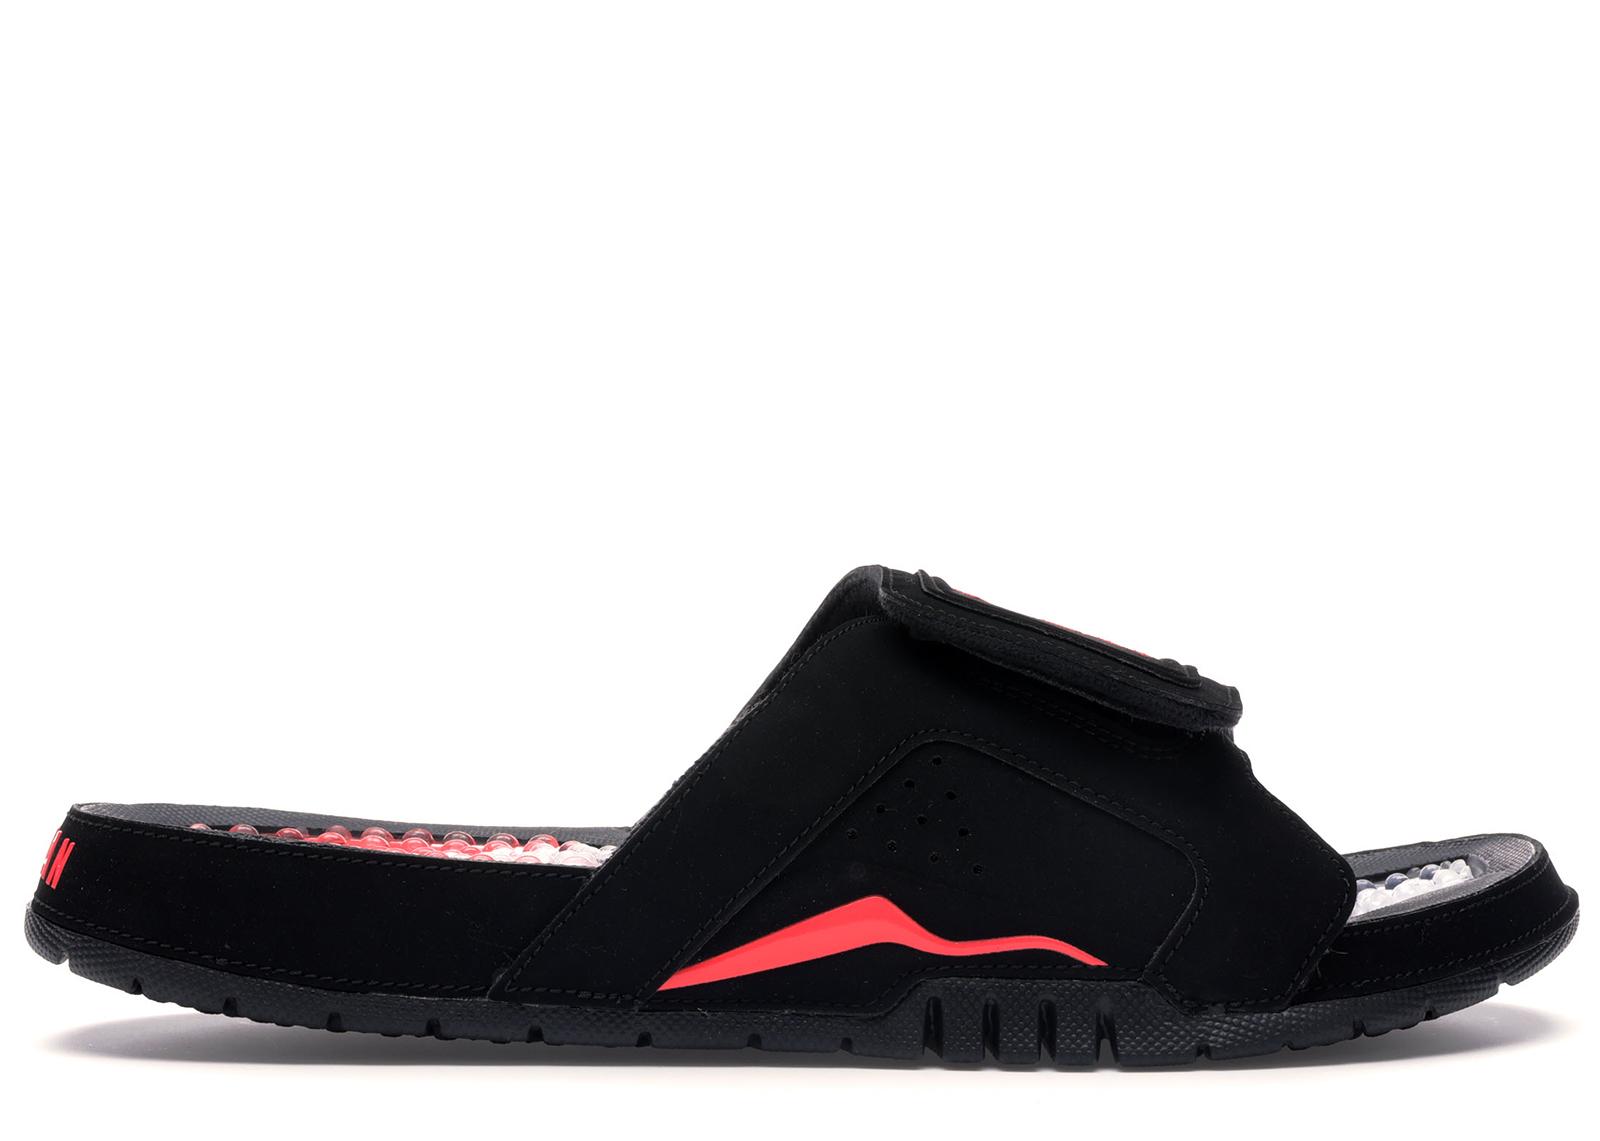 Jordan Hydro 6 Retro Black Infrared 23